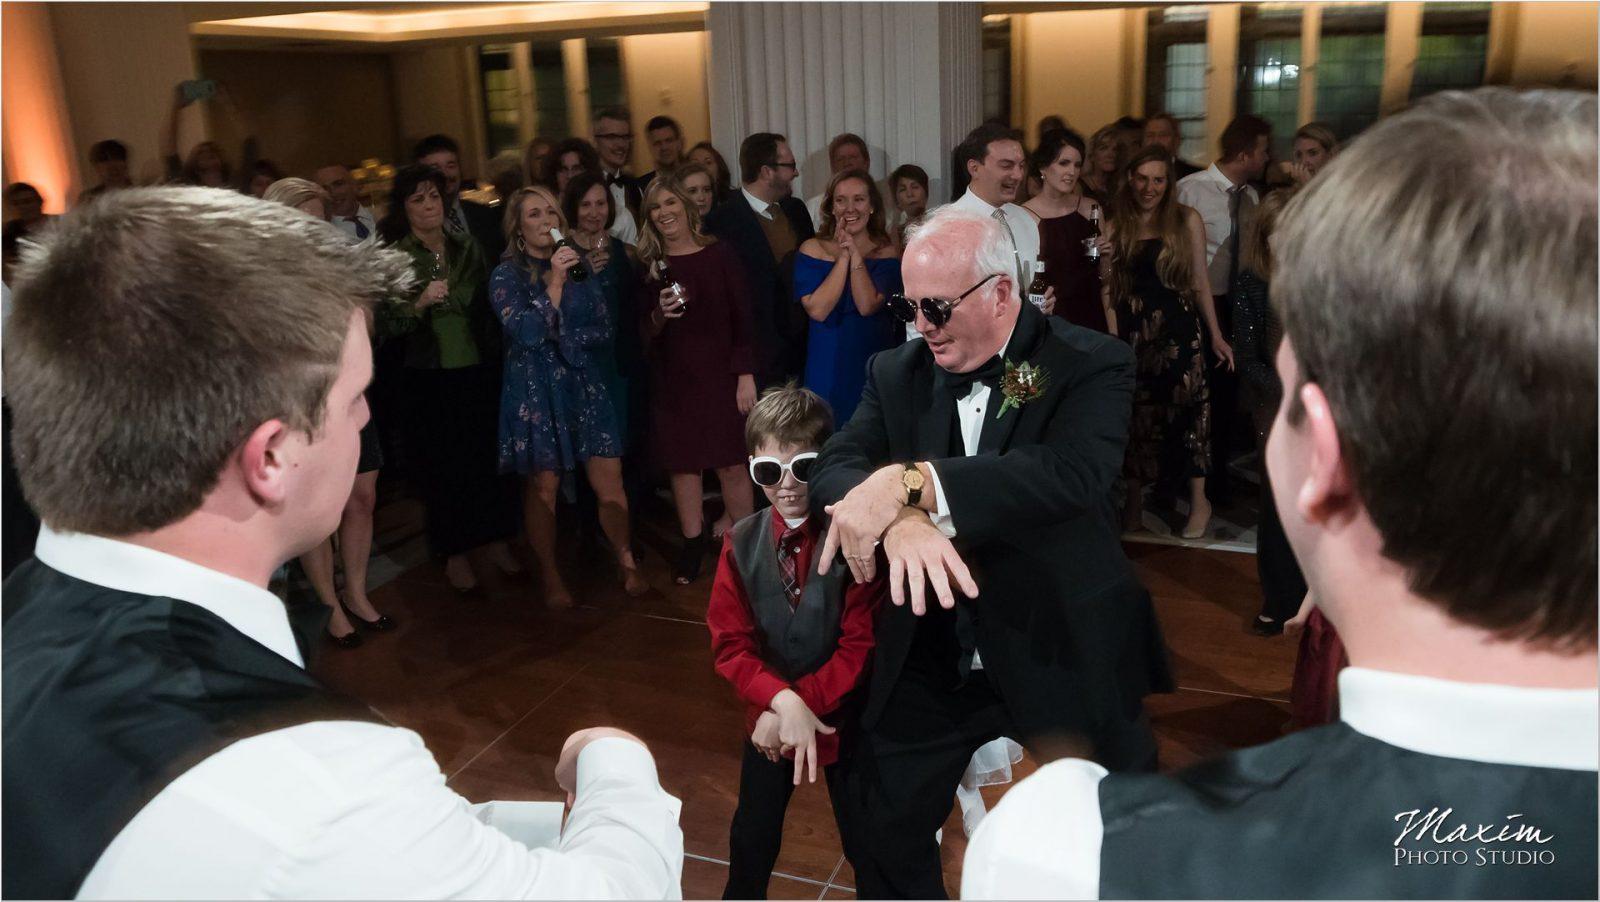 Renaissance Hotel Cincinnati Wedding reception Gangnam style